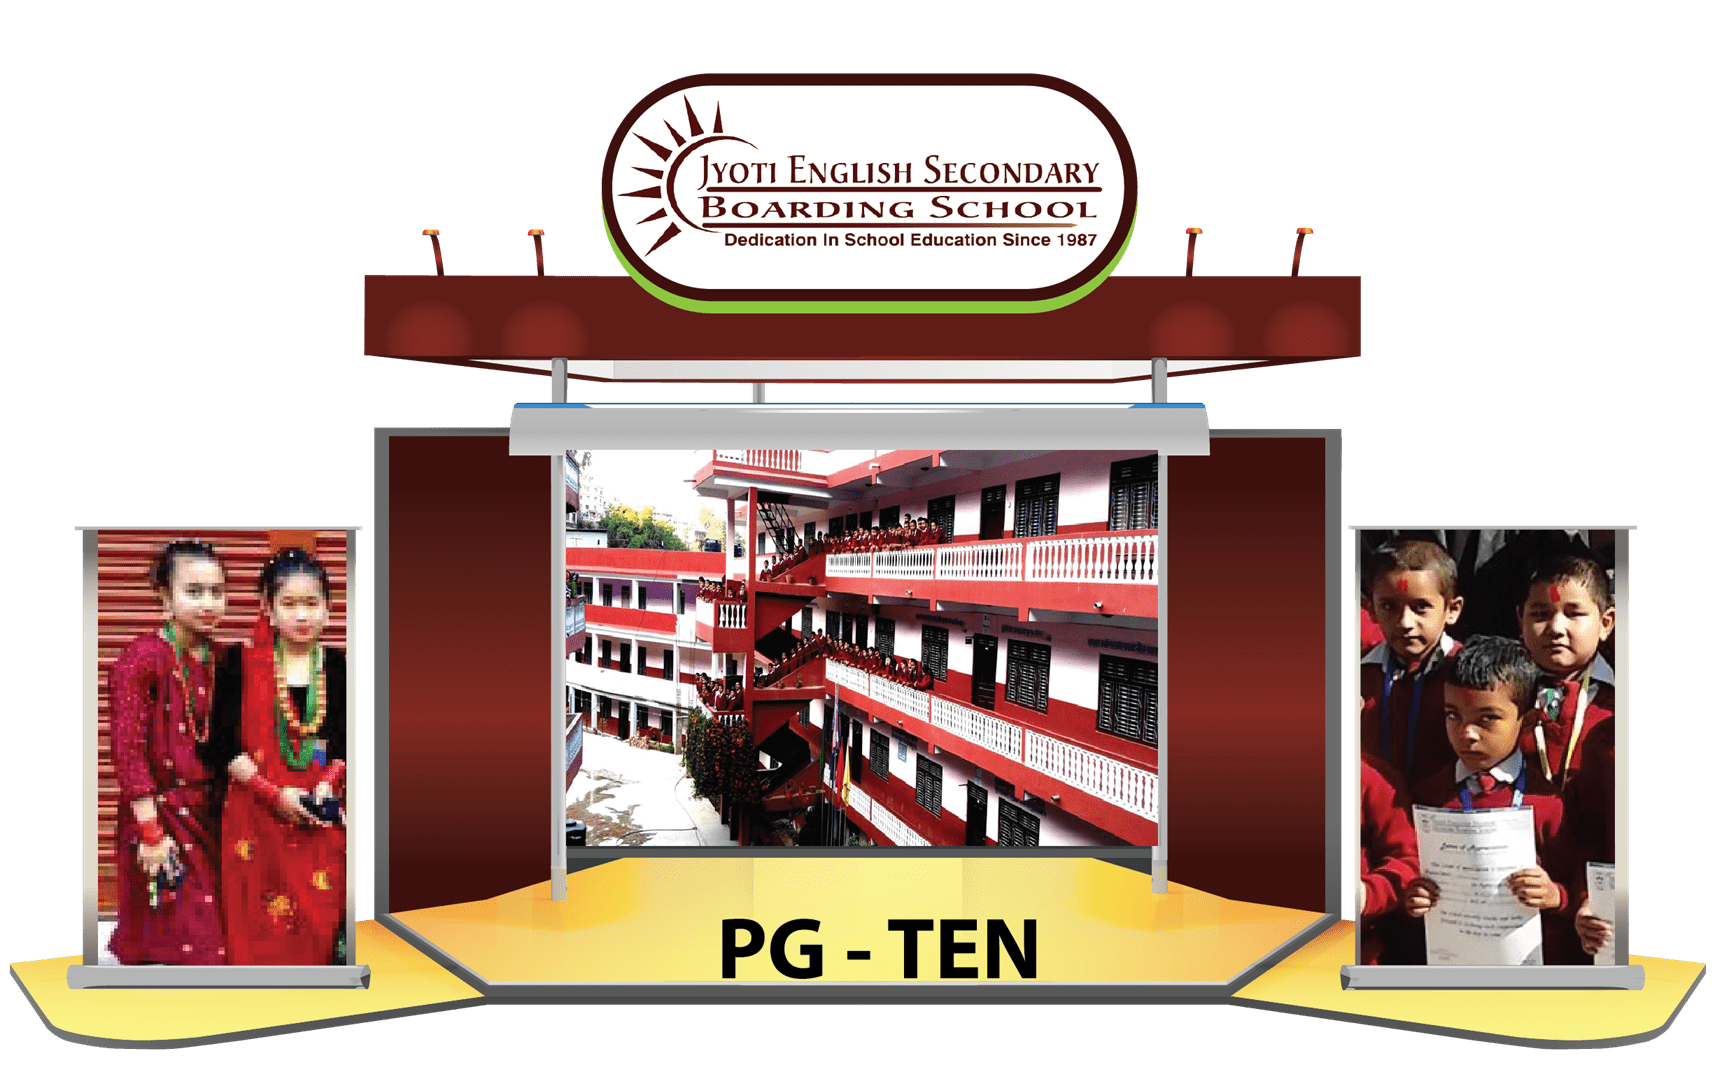 Jyoti English Secondary Boarding School